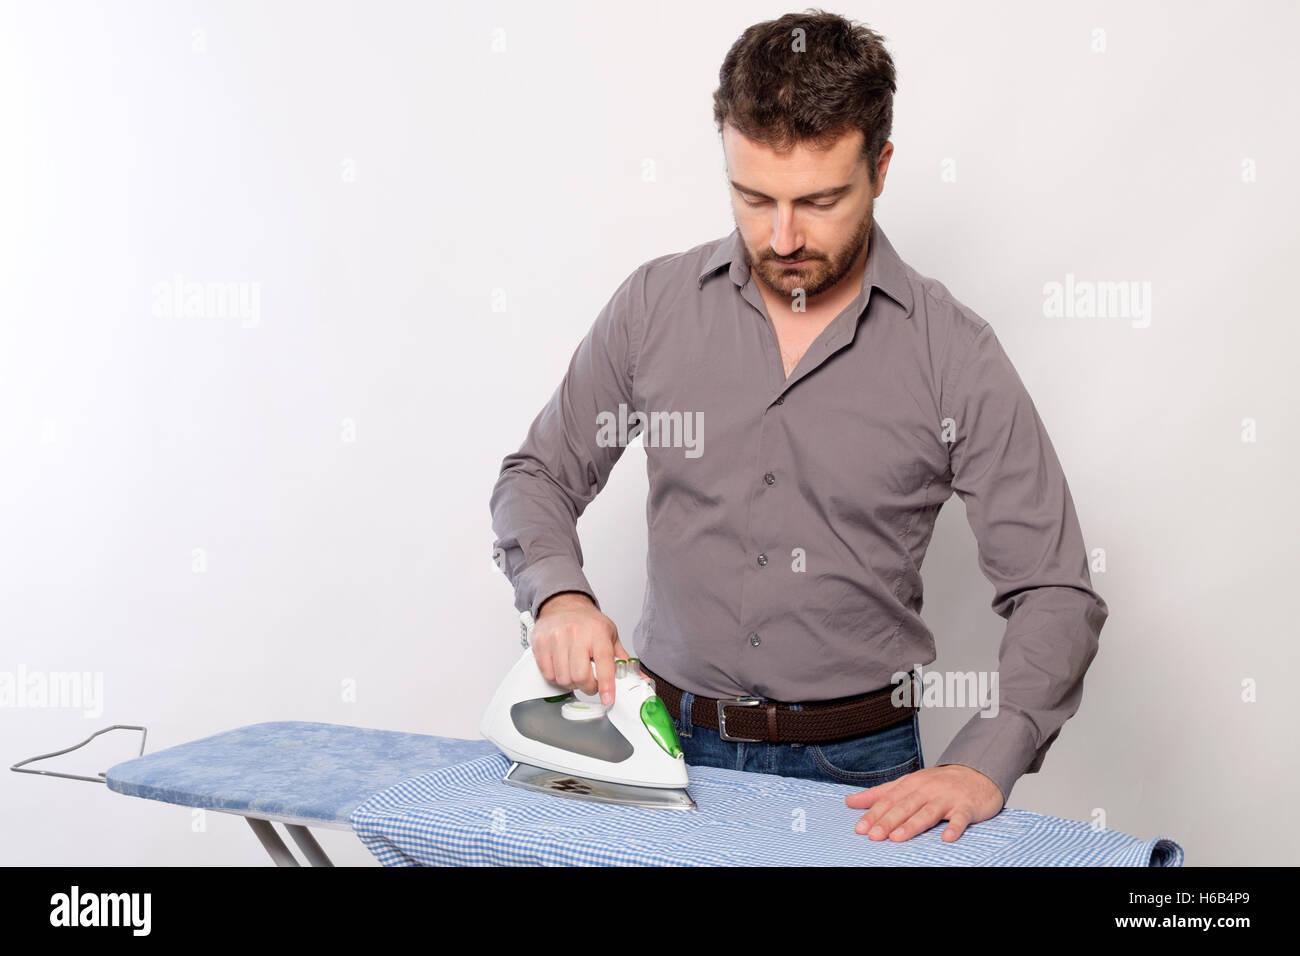 Portrait of single man ironing a shirt - Stock Image